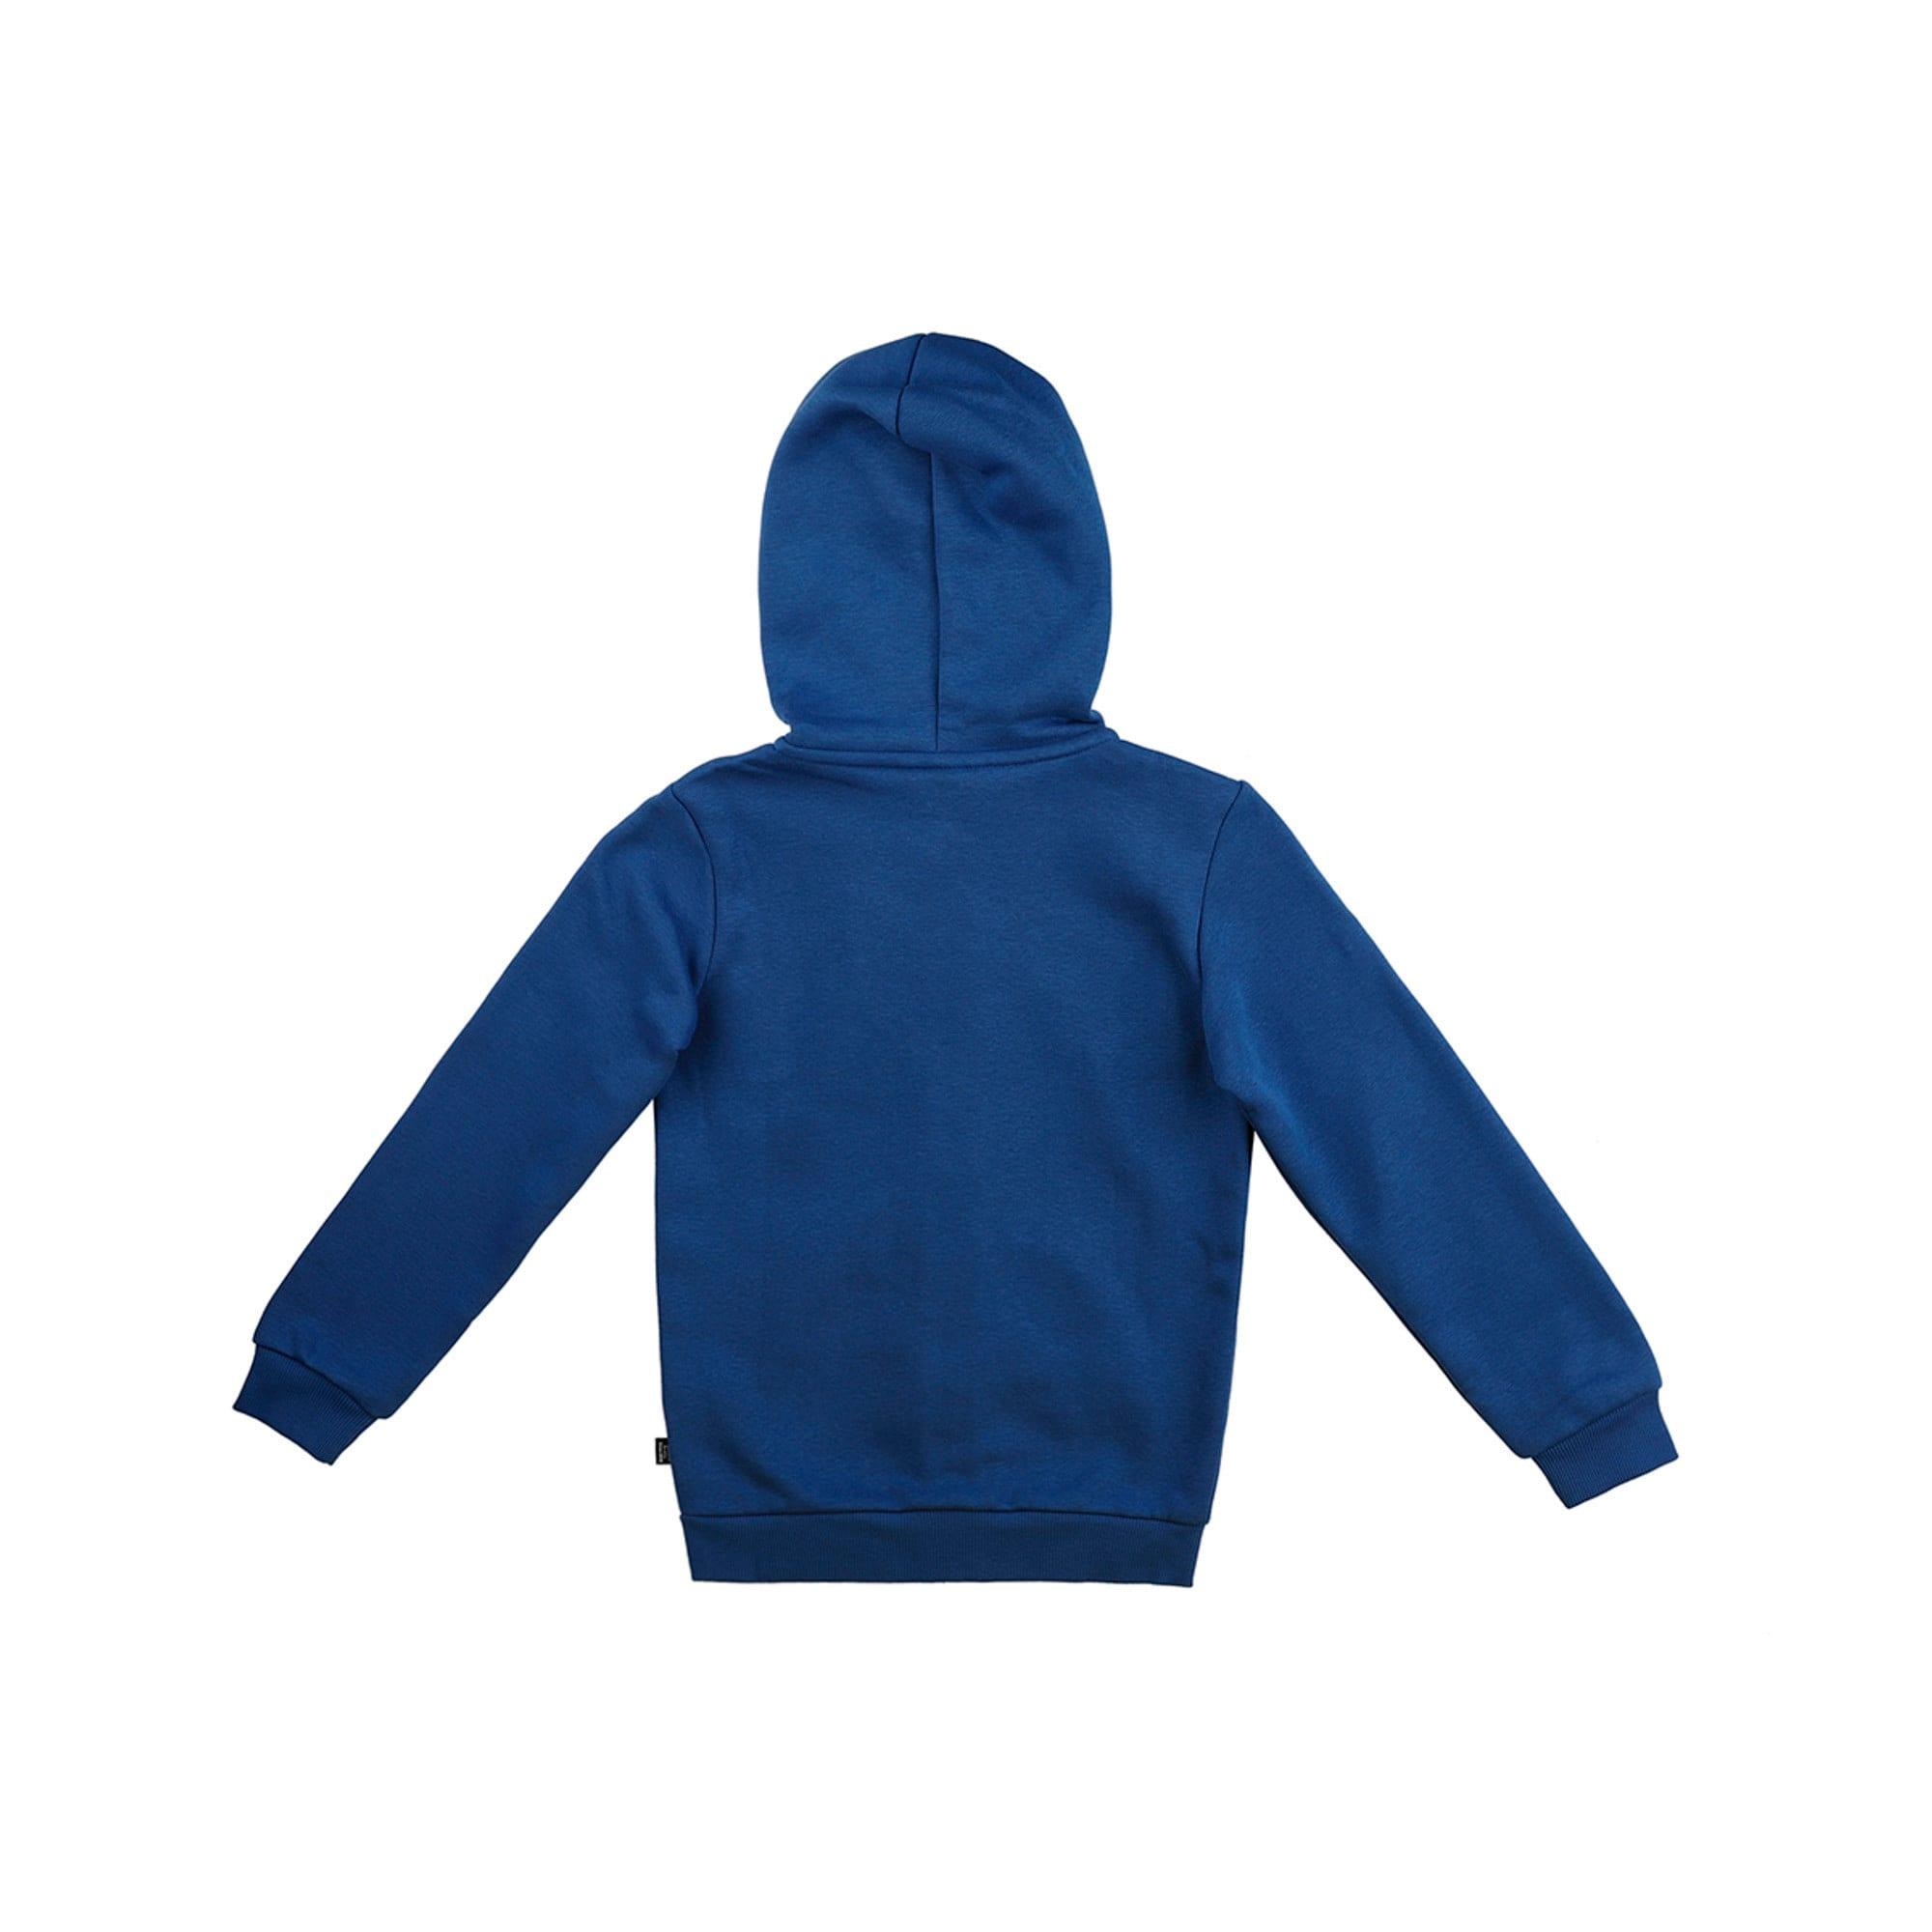 Thumbnail 2 of Essentials Hooded Boys' Jacket, Galaxy Blue, medium-IND